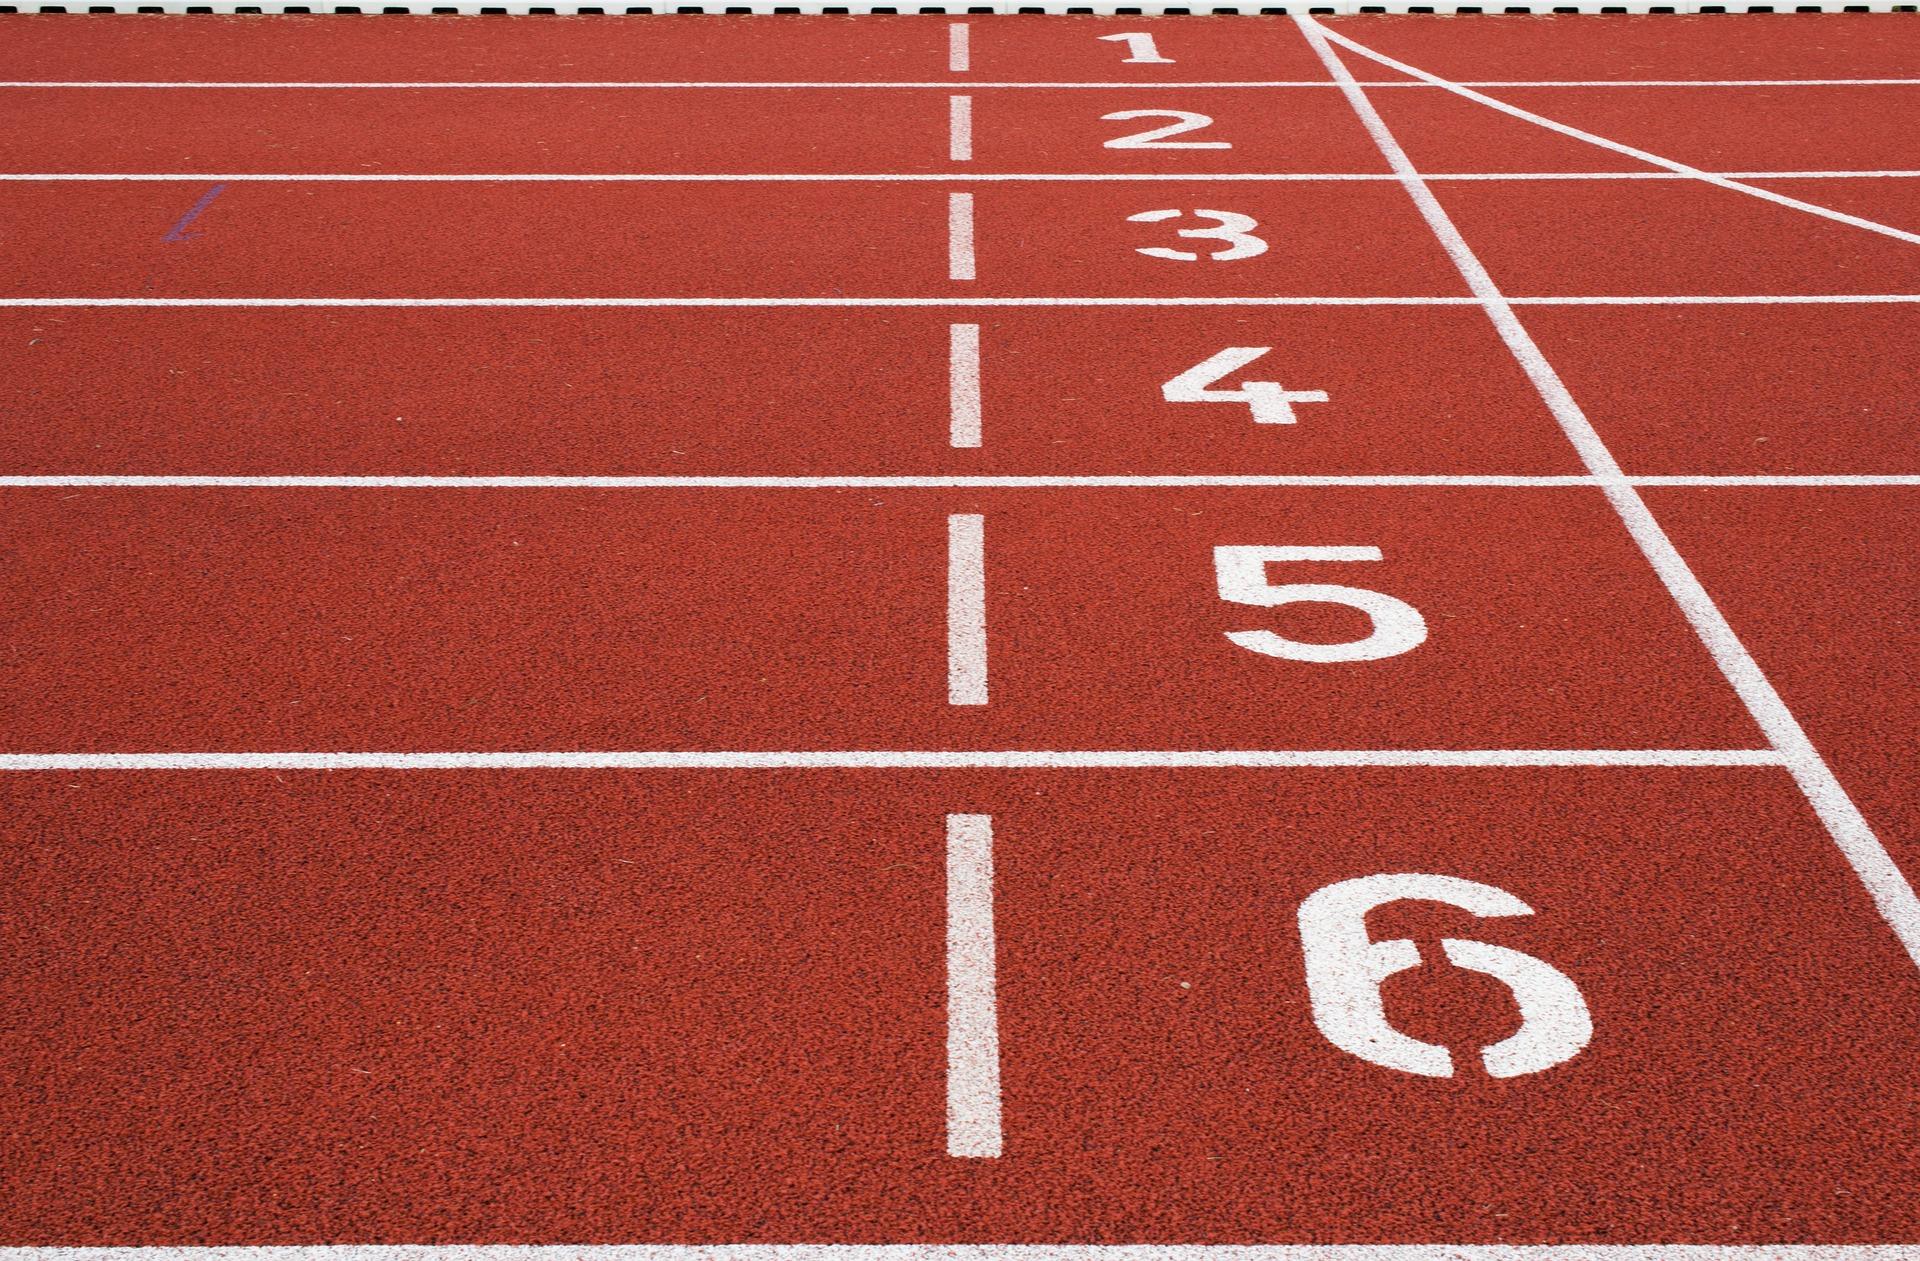 pista atletica